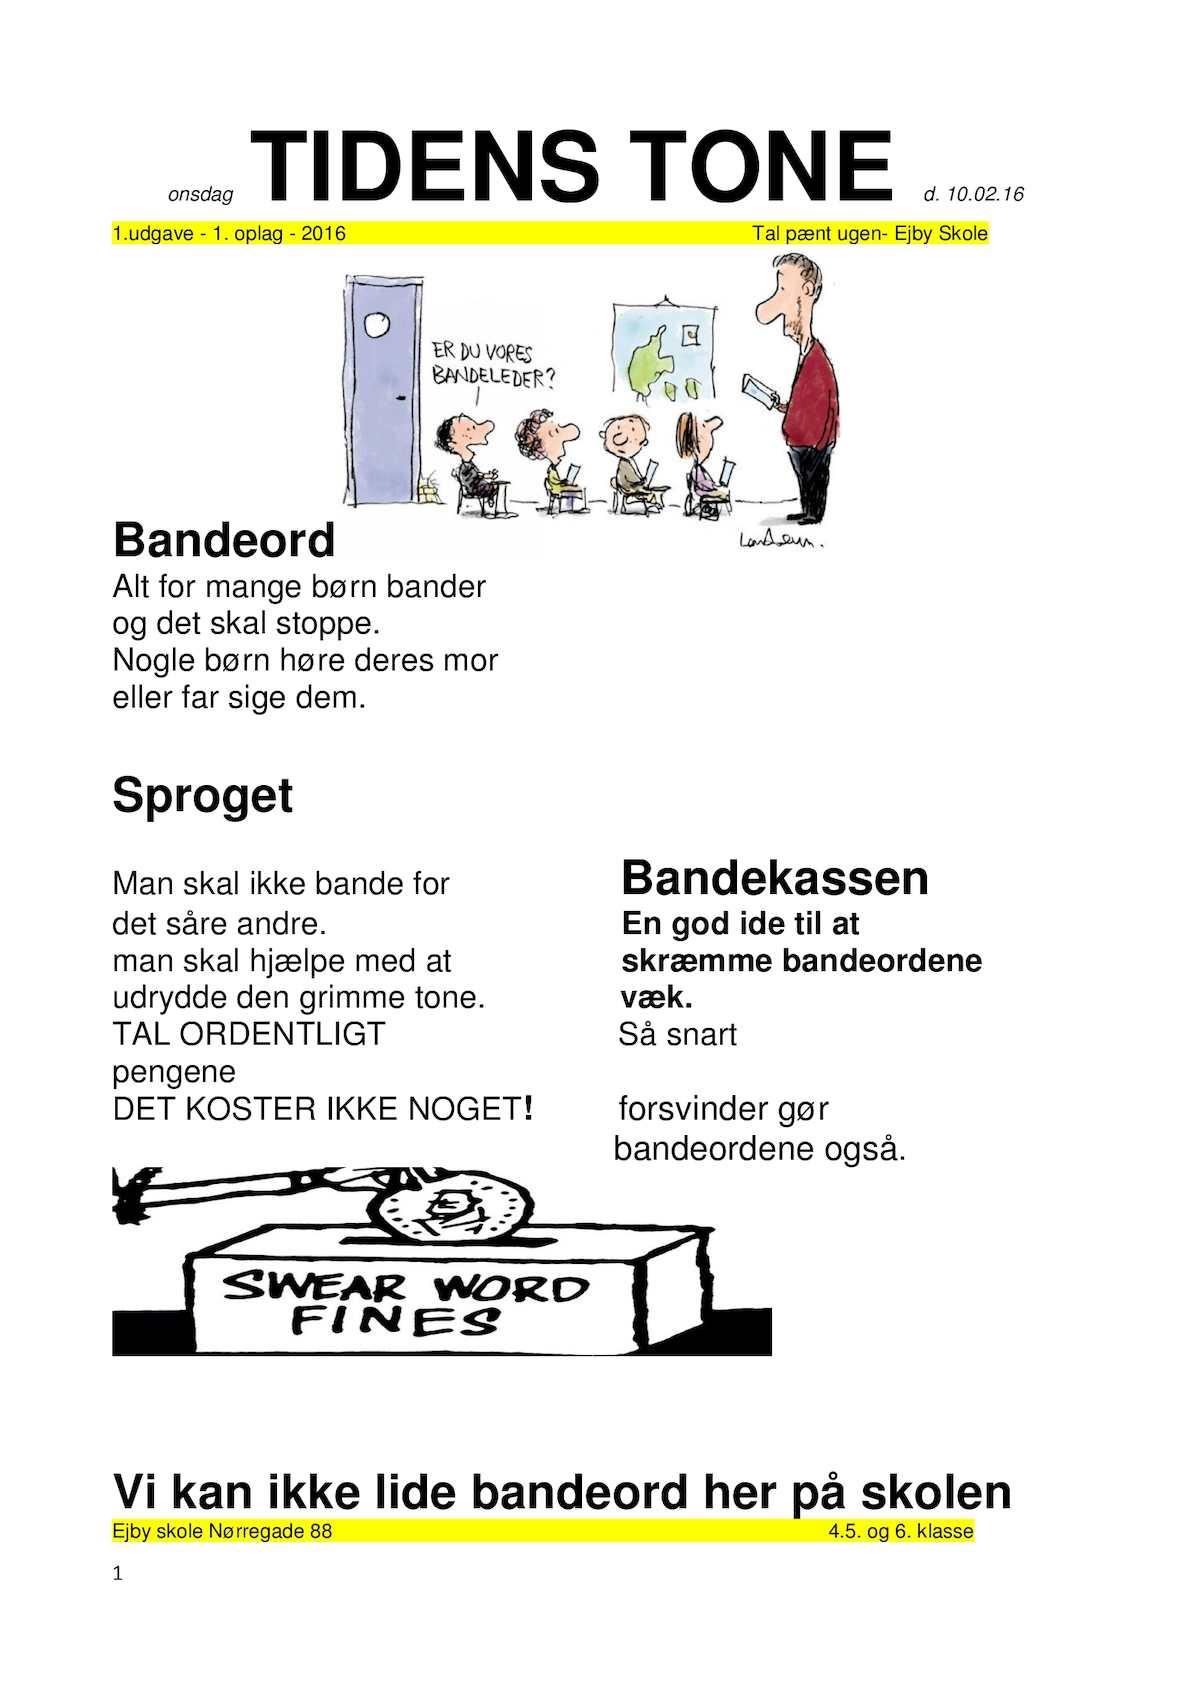 gamle danske bandeord